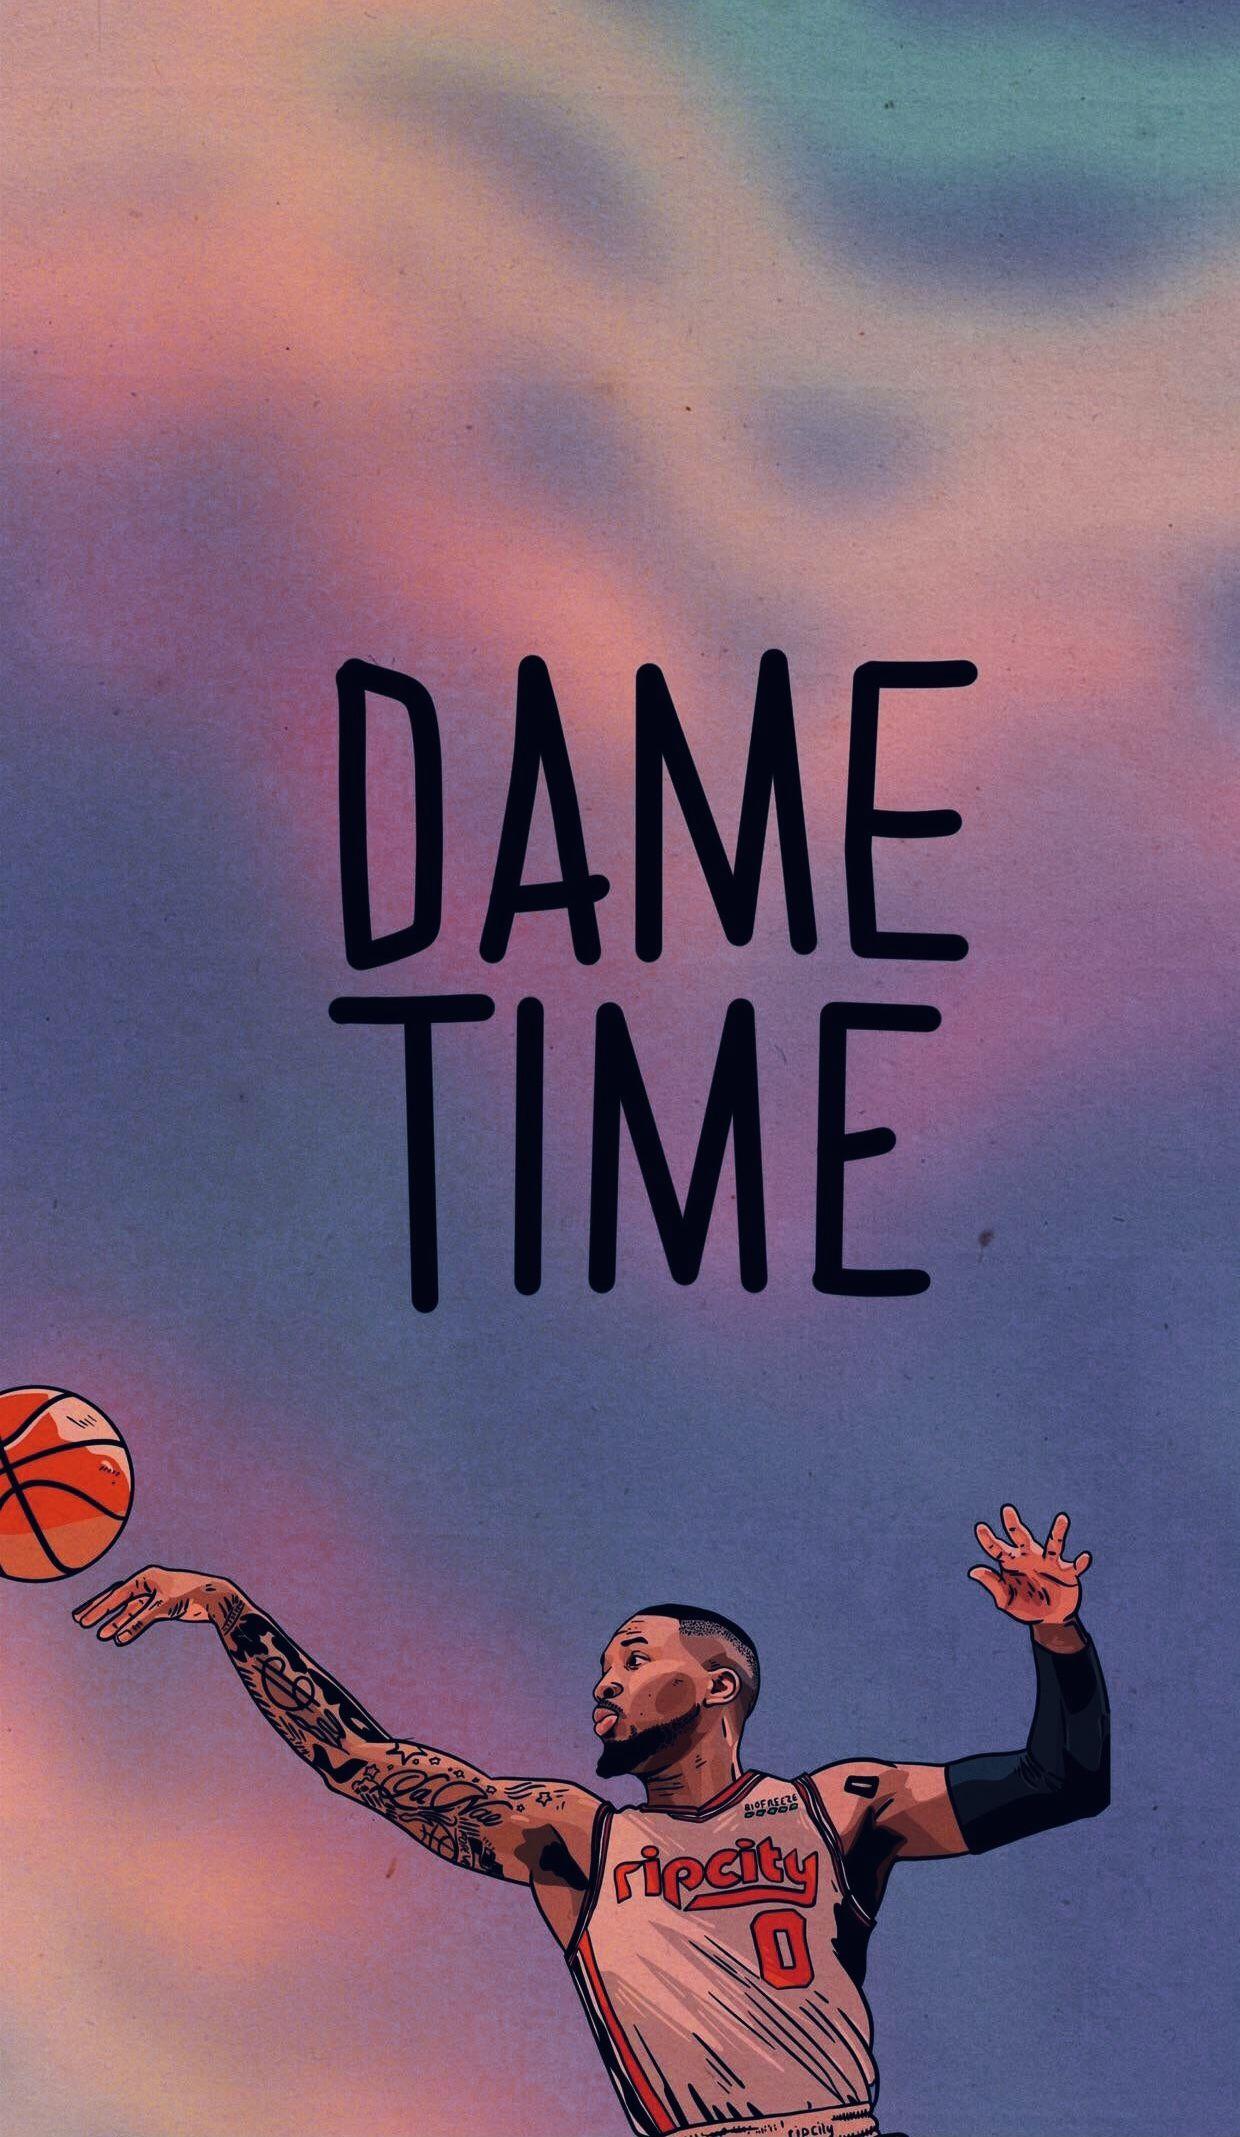 Pin By Garyfalia On Illustriations In 2021 Nba Basketball Art Basketball Wallpaper Nba Players